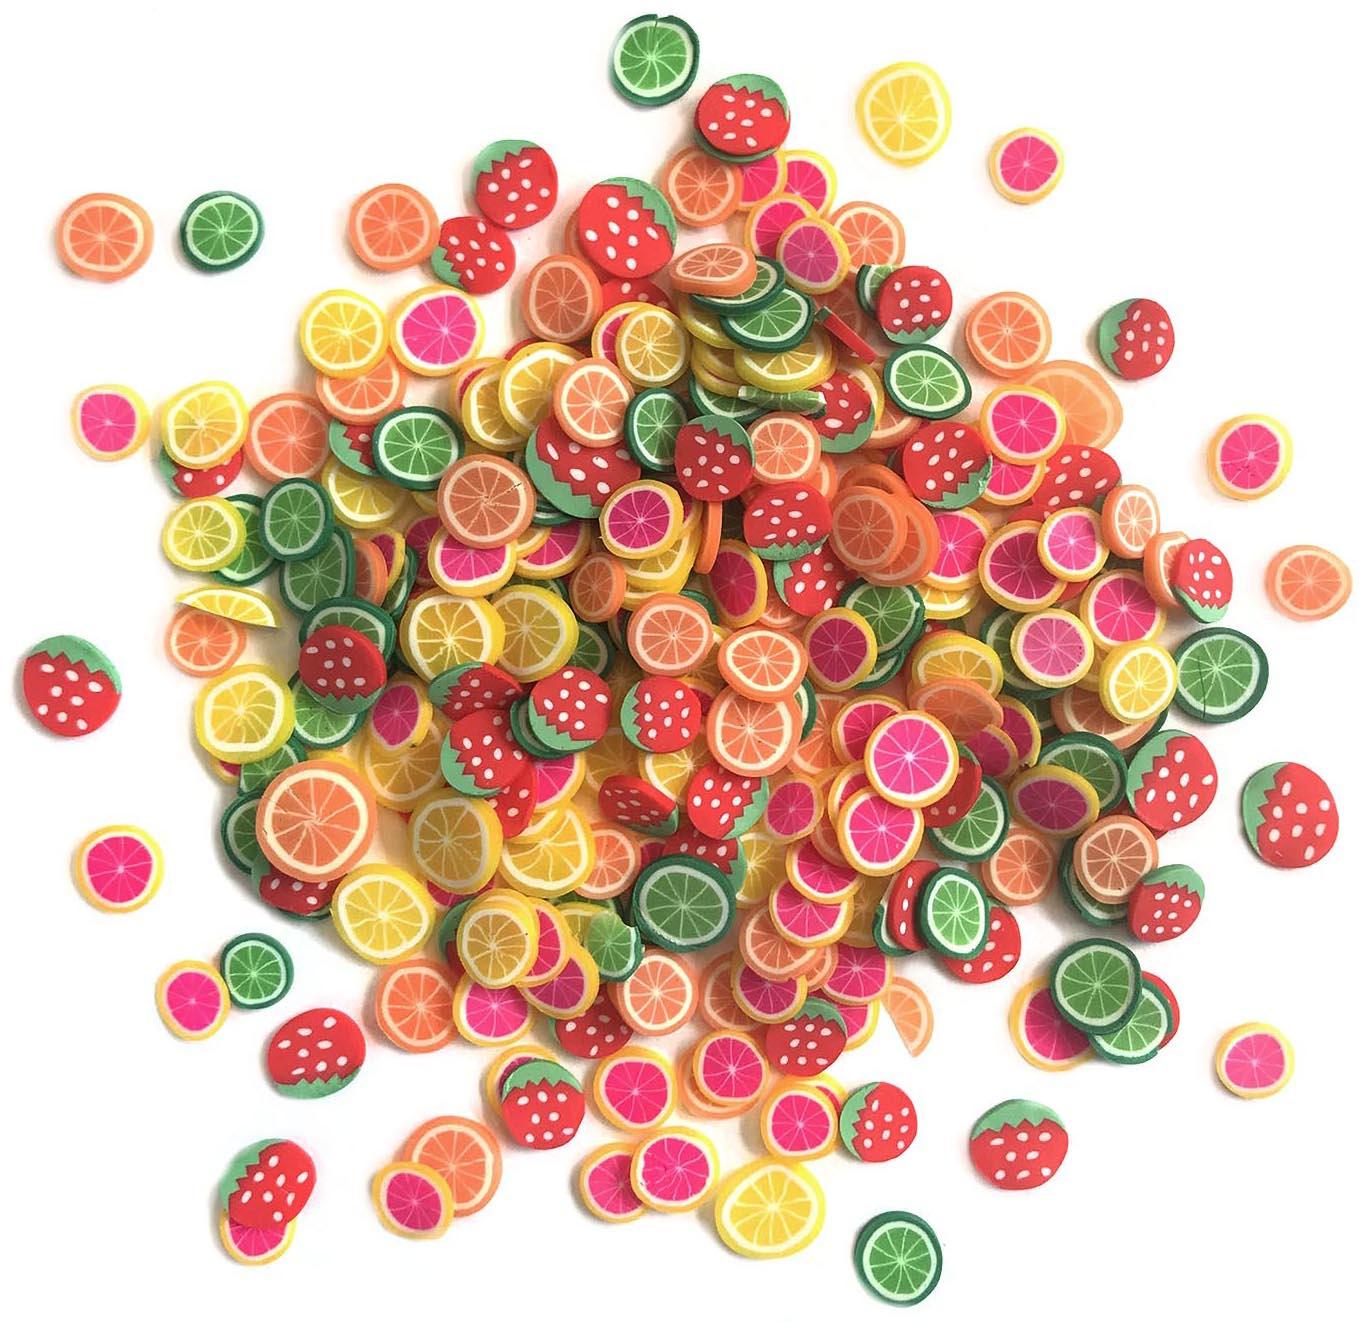 Buttons Galore Sprinkletz Embellishments 12g-Fruit Cocktail